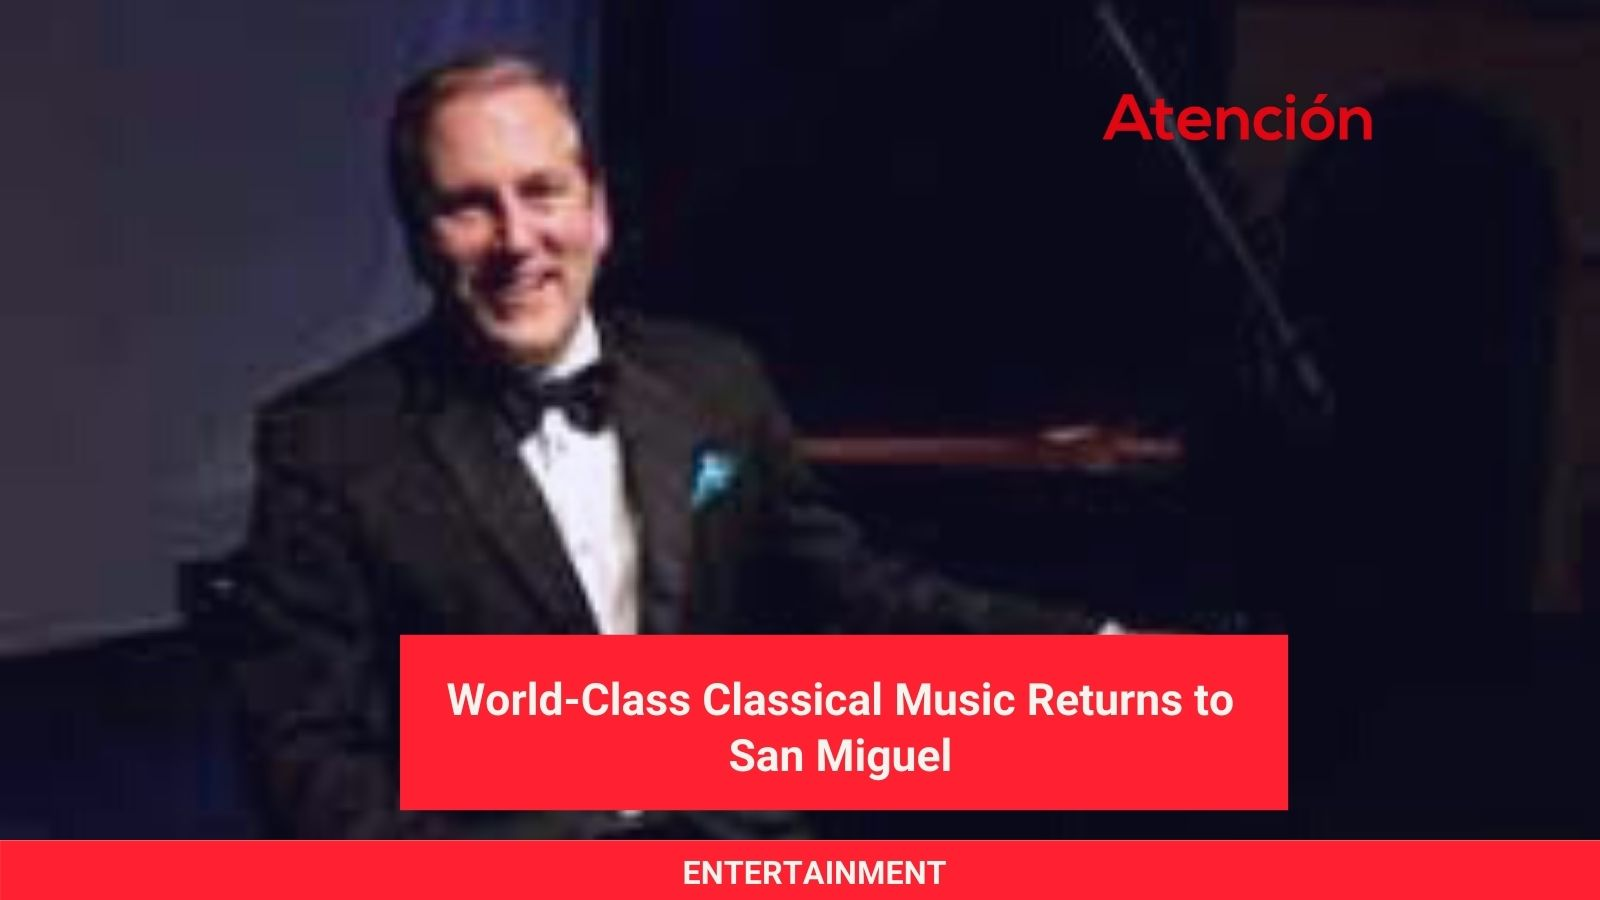 World-Class-Classical-Music-Returns-to-San-Miguel.jpg